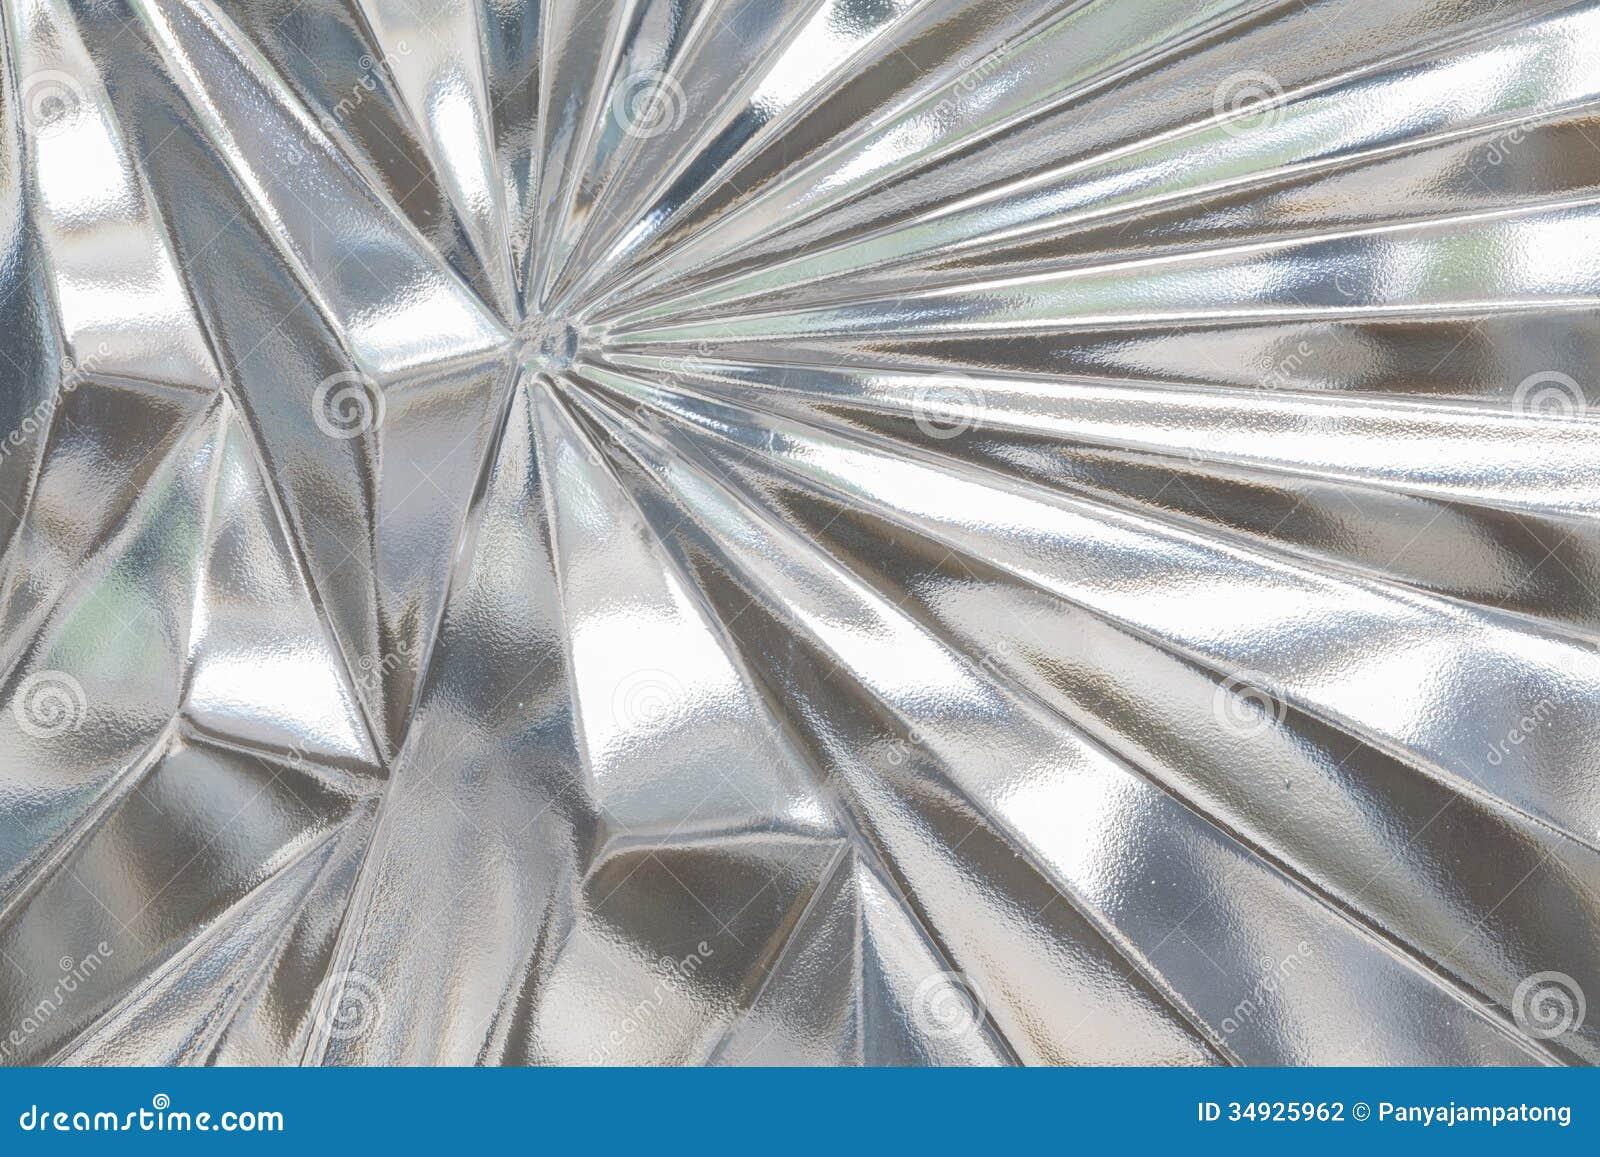 texture transparente de mur de verre photo stock image 34925962. Black Bedroom Furniture Sets. Home Design Ideas